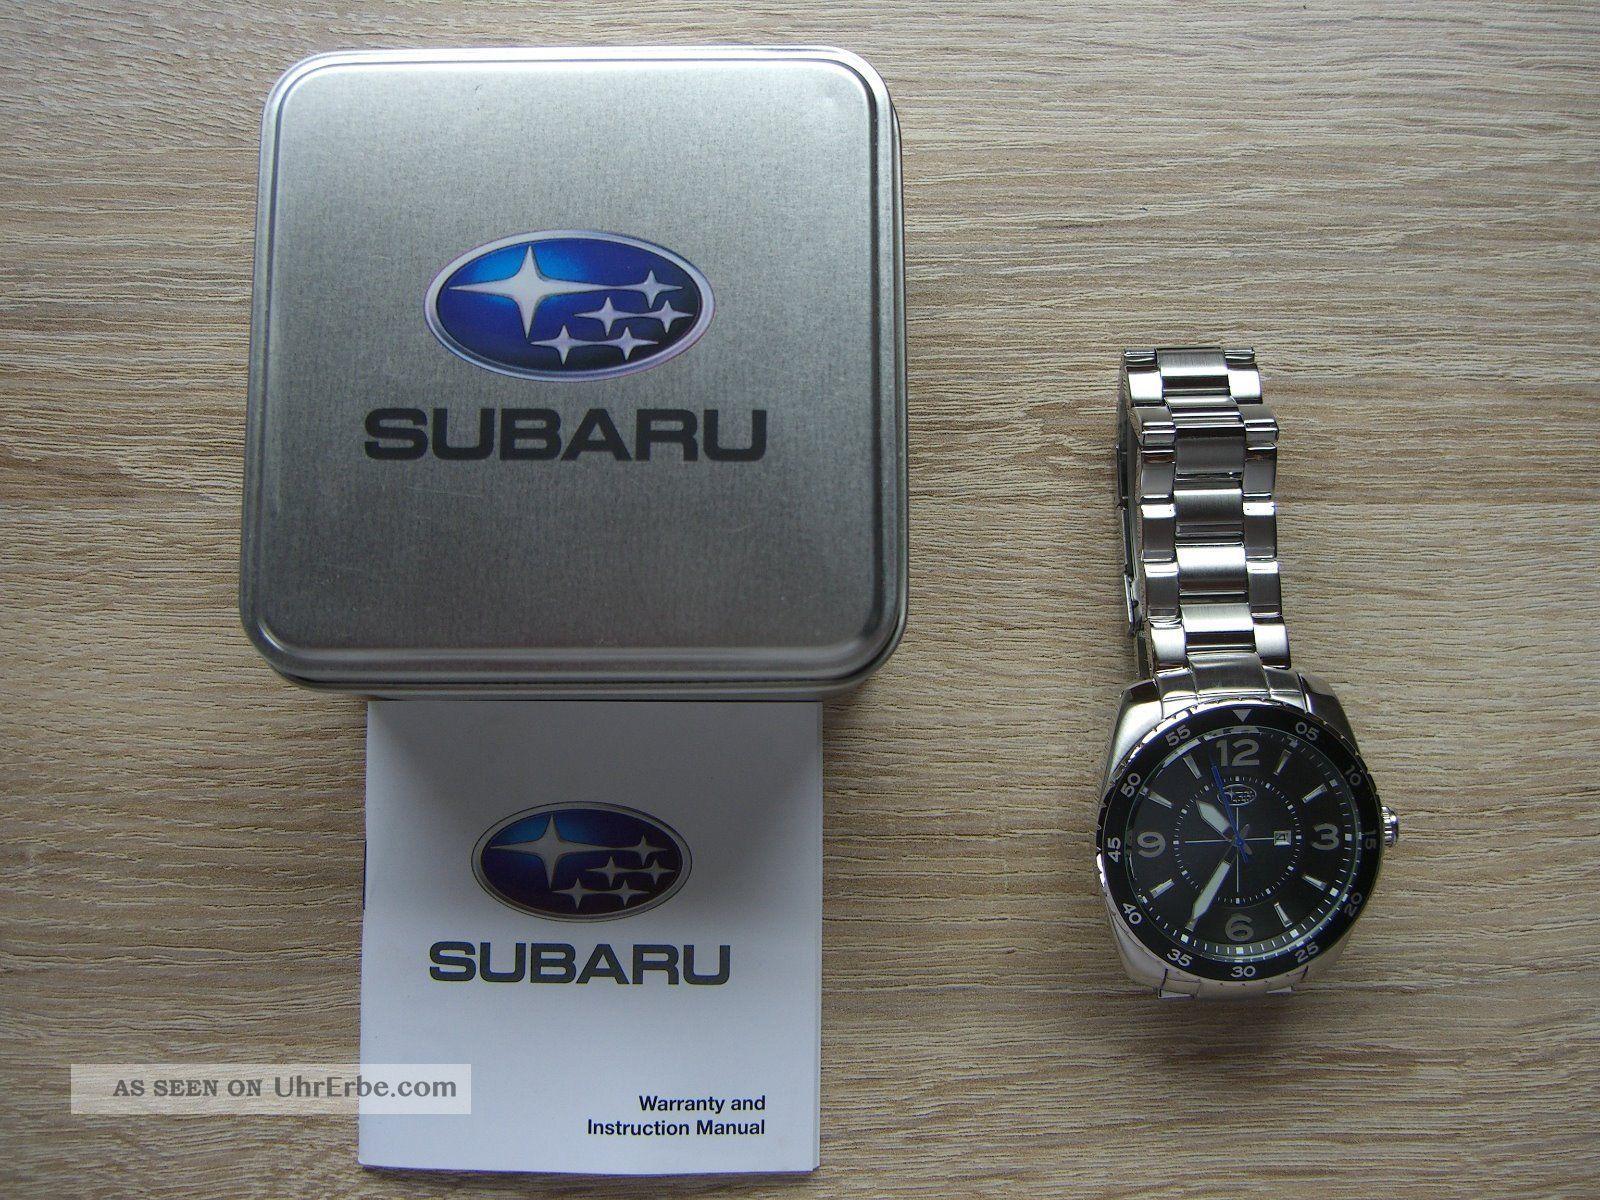 Orginal Subaru Uhr Edelstahl Armbanduhren Bild